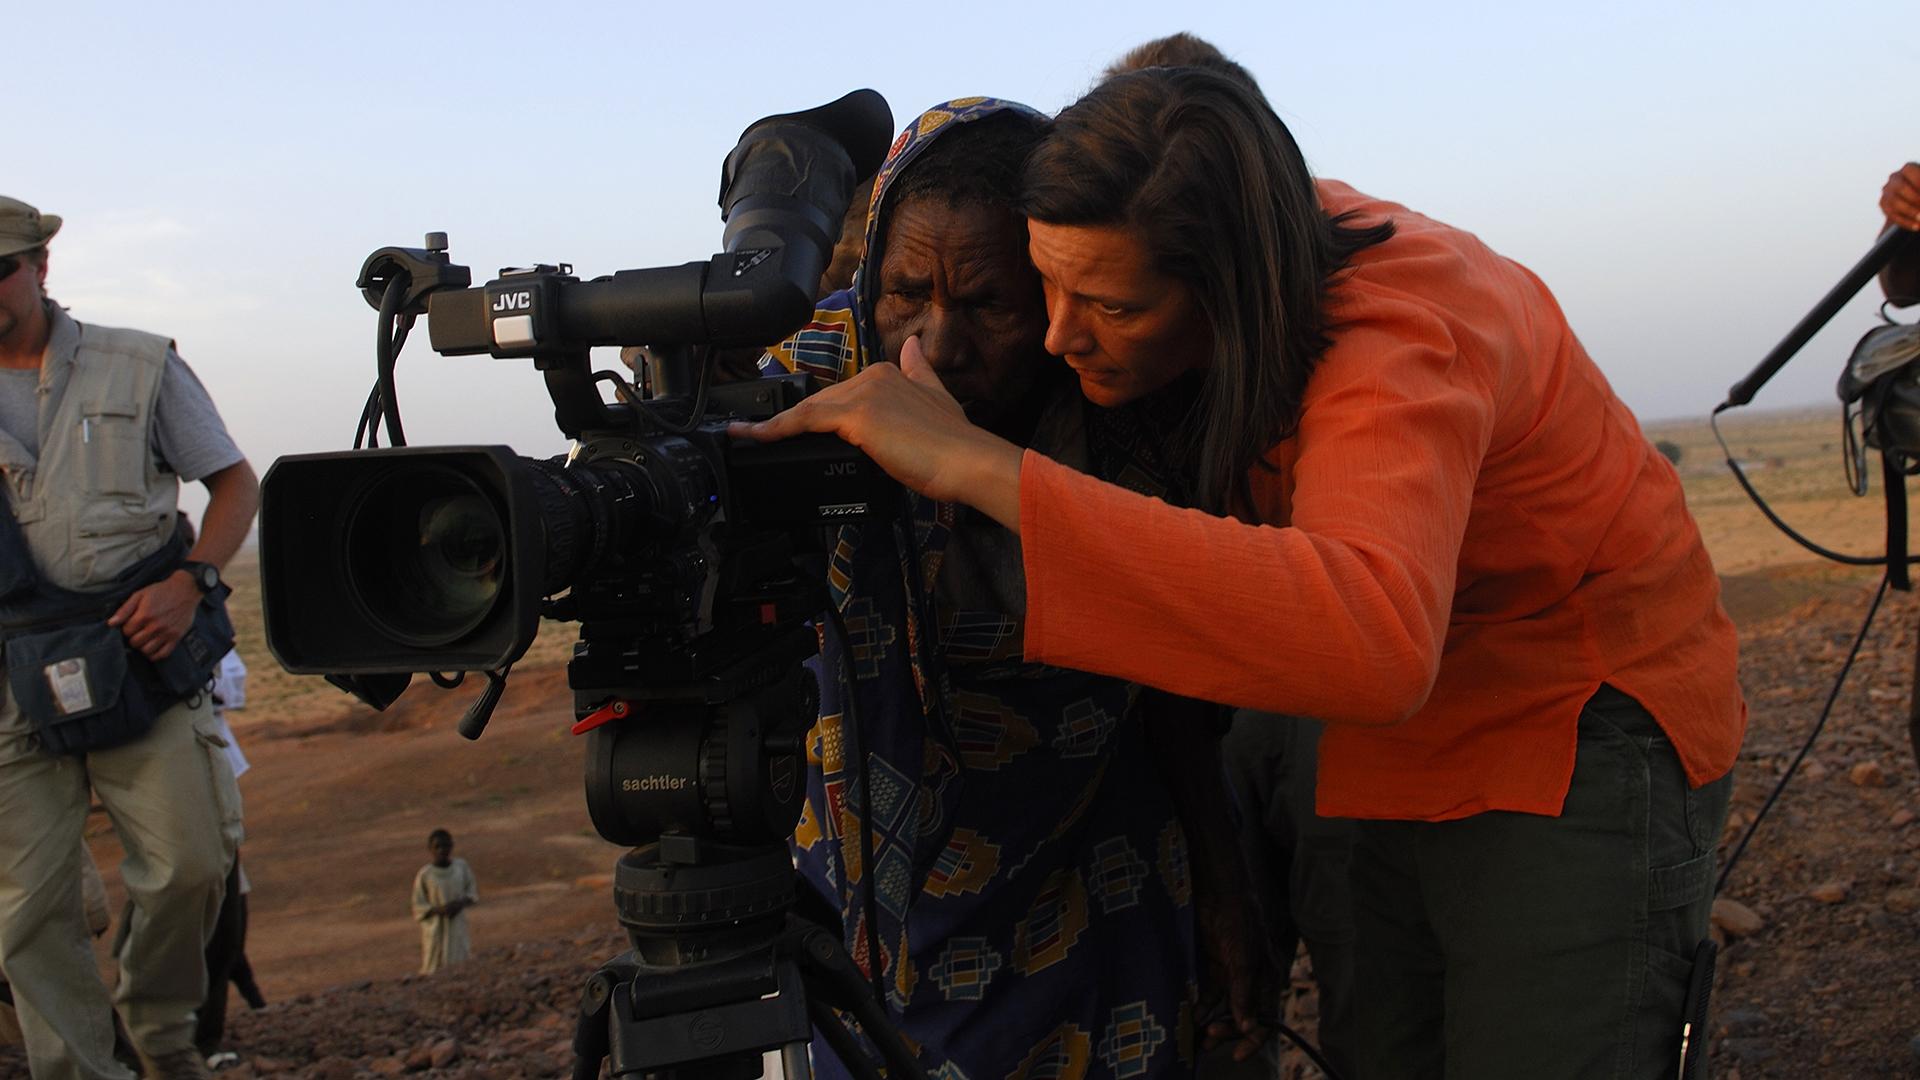 Inventive, intimate documentary 'Cameraperson' to debut on POV